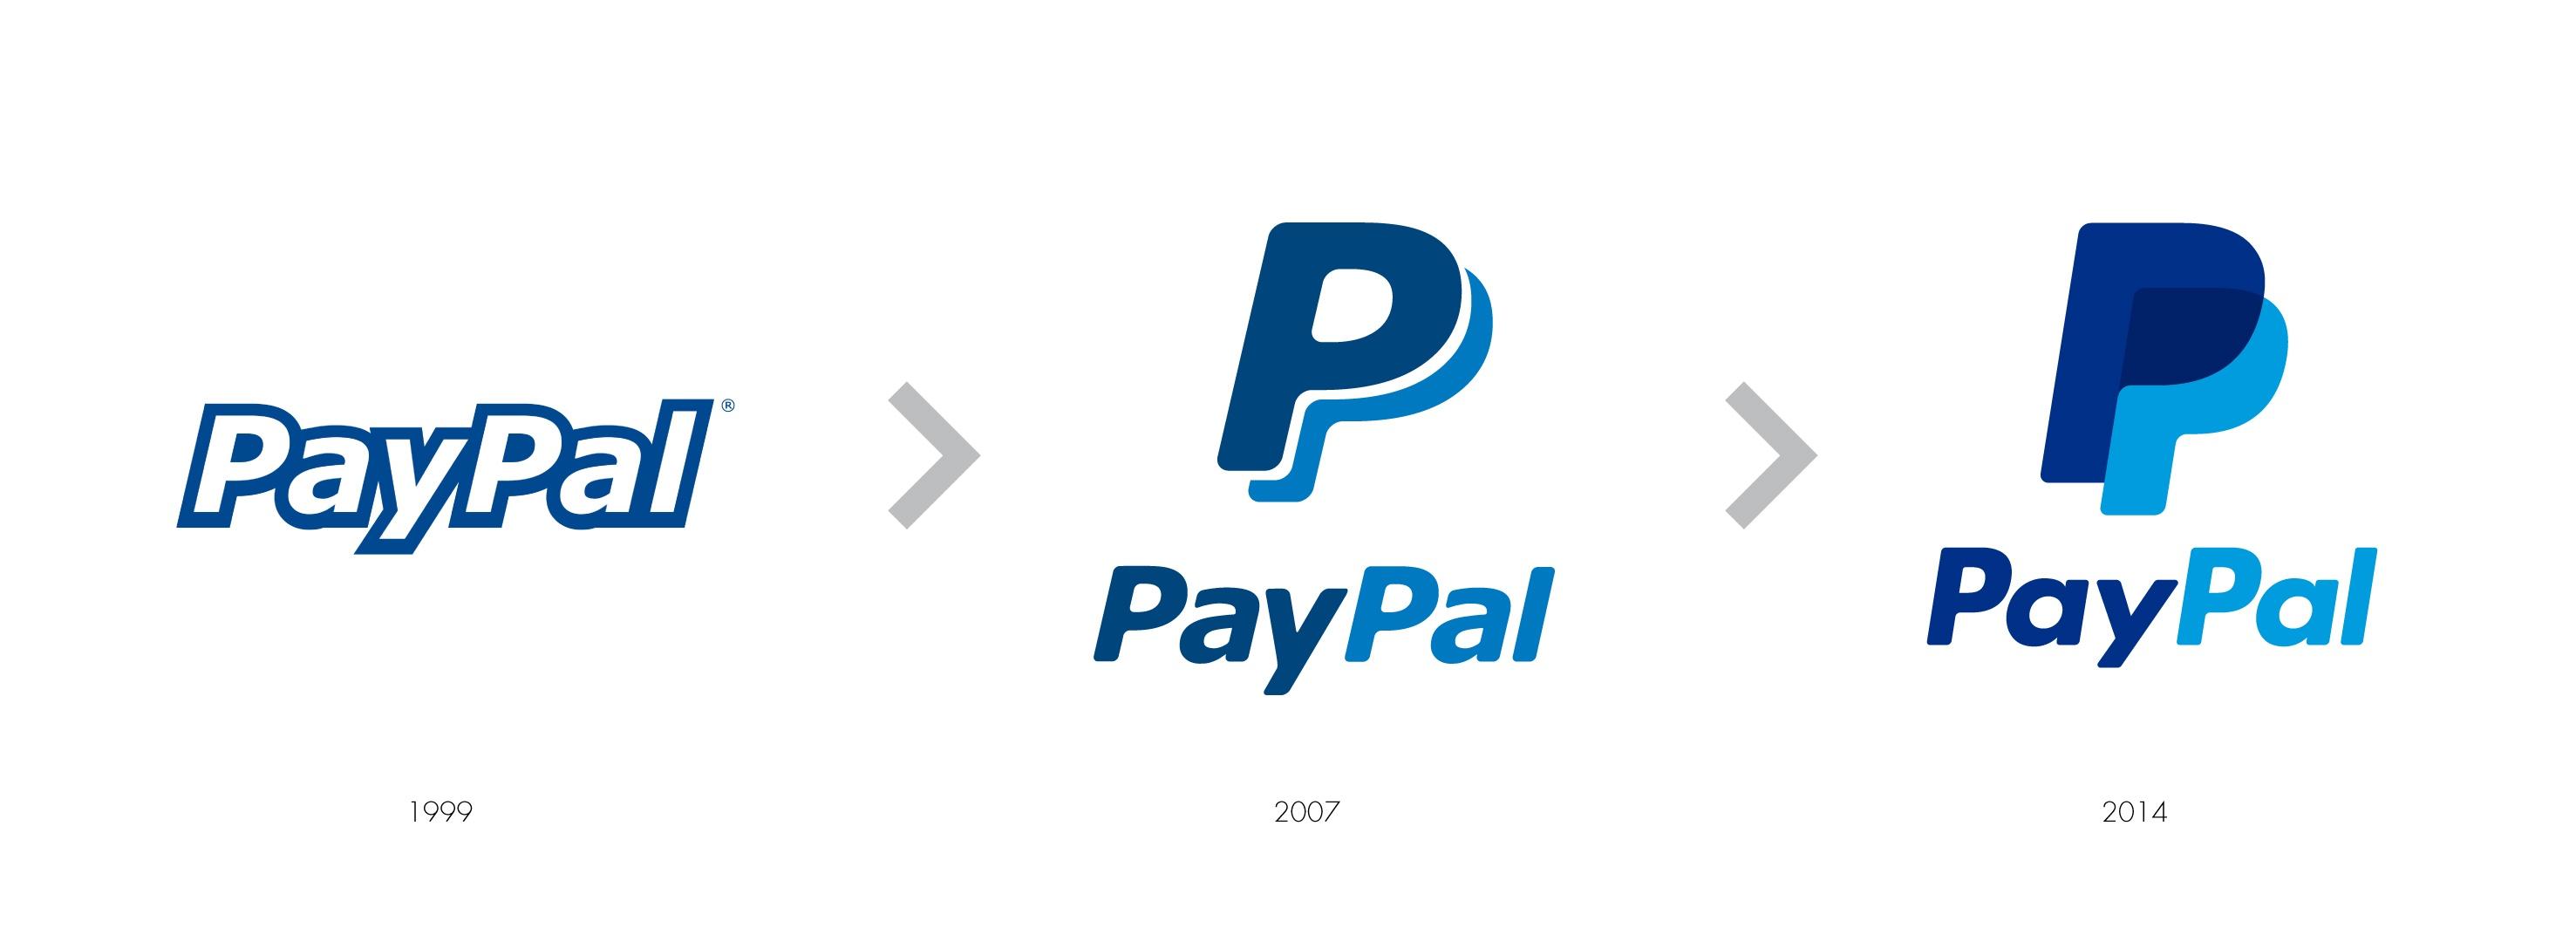 Branding Paypal